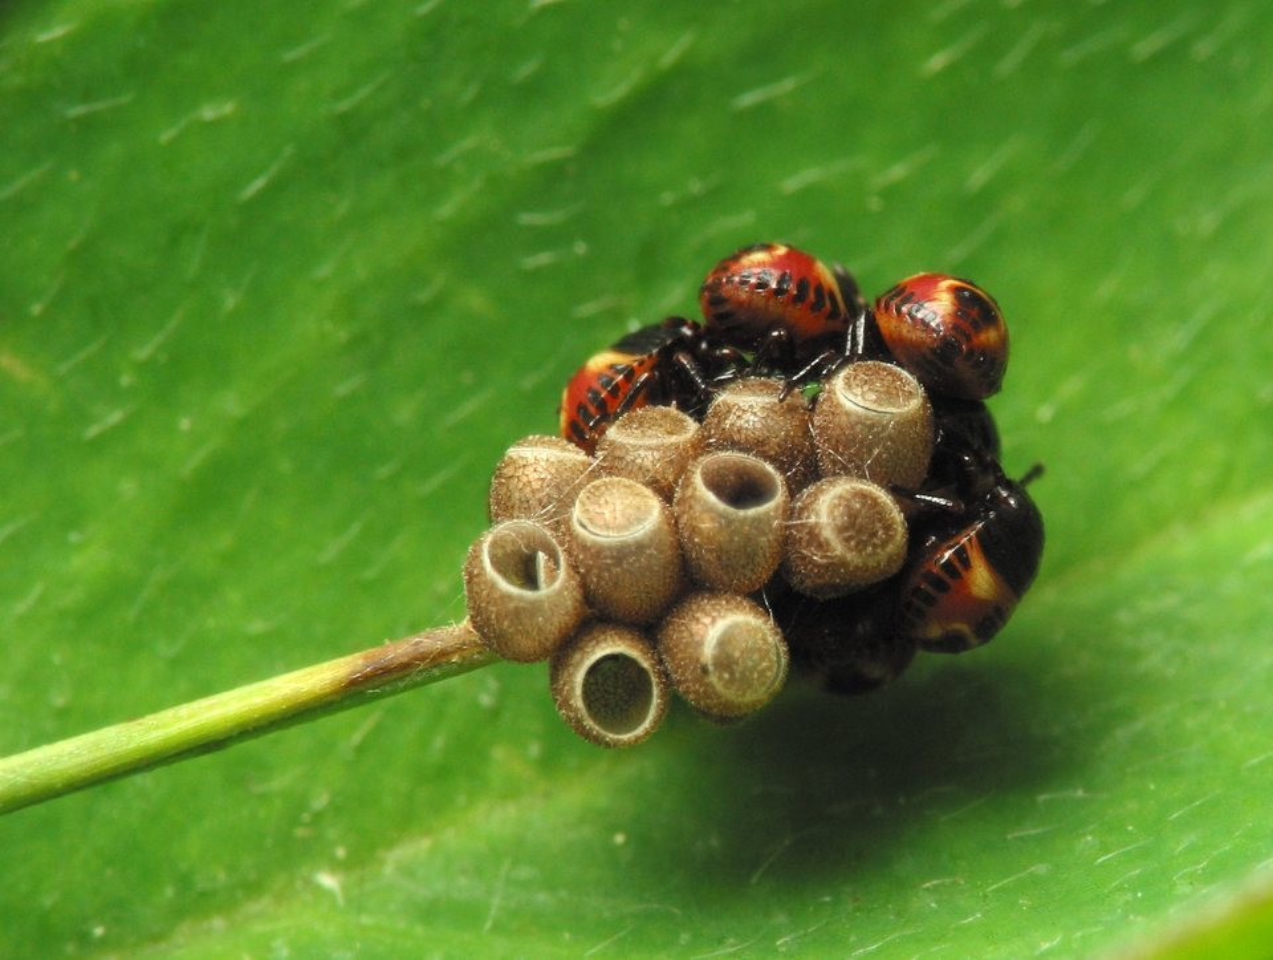 Carpocoris-pudicus-3052.jpg